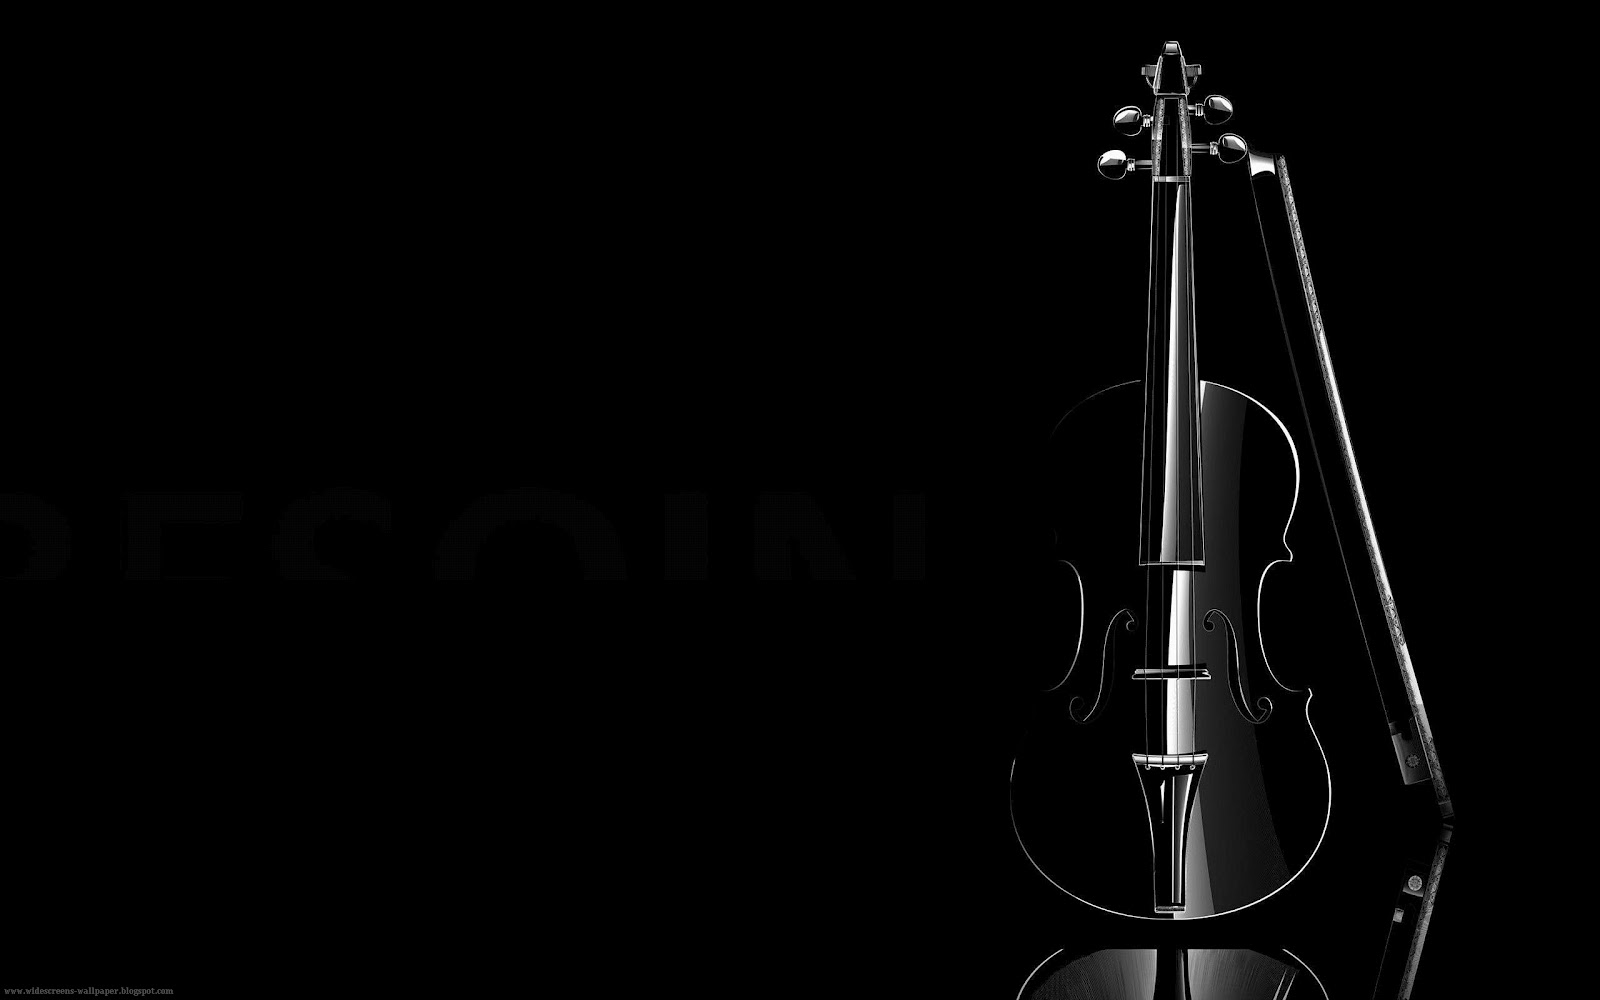 Black and dark violins